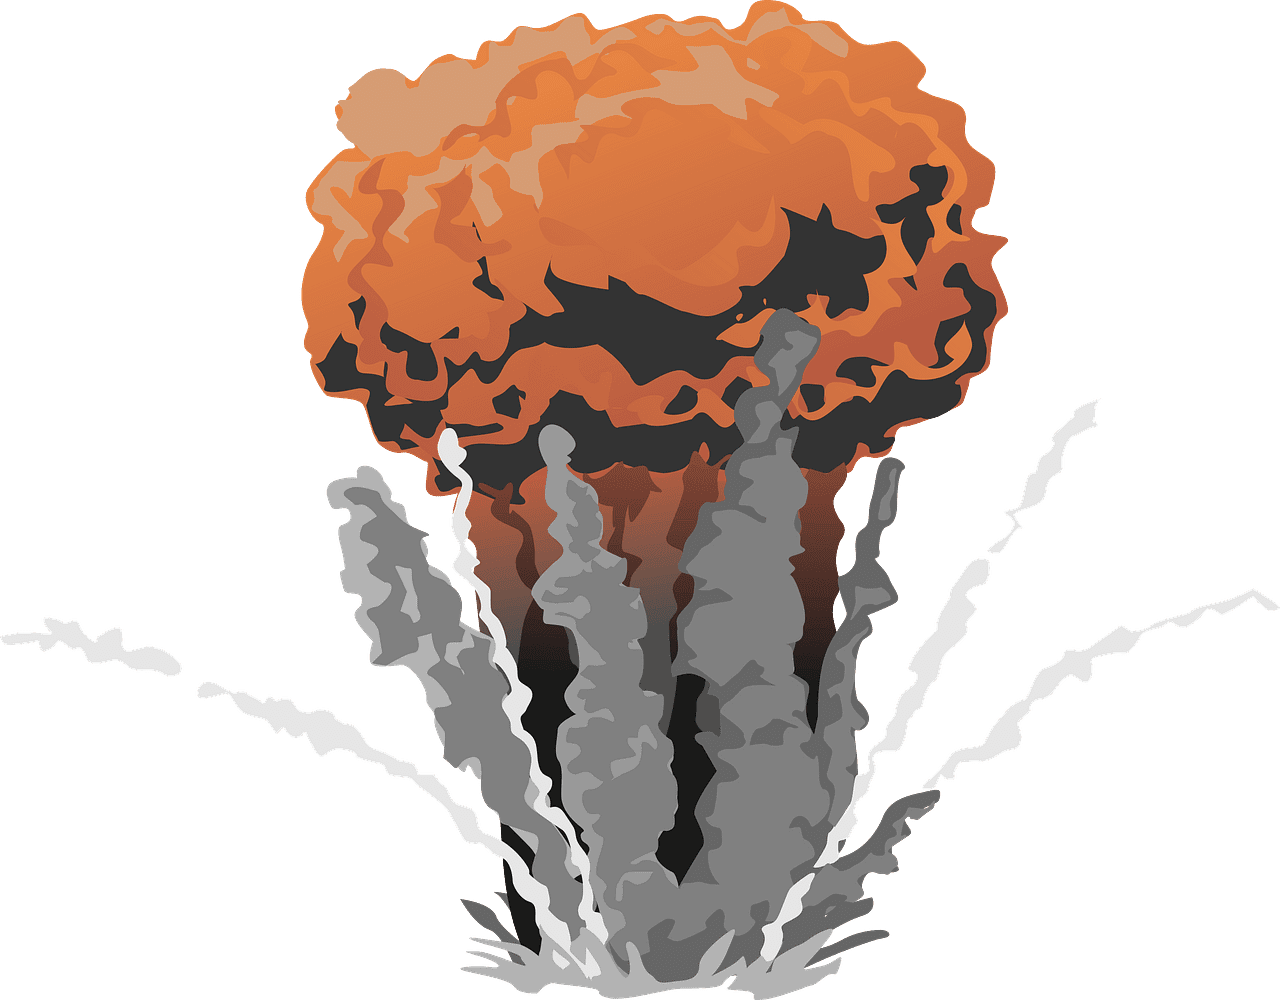 Explosion clipart transparent image